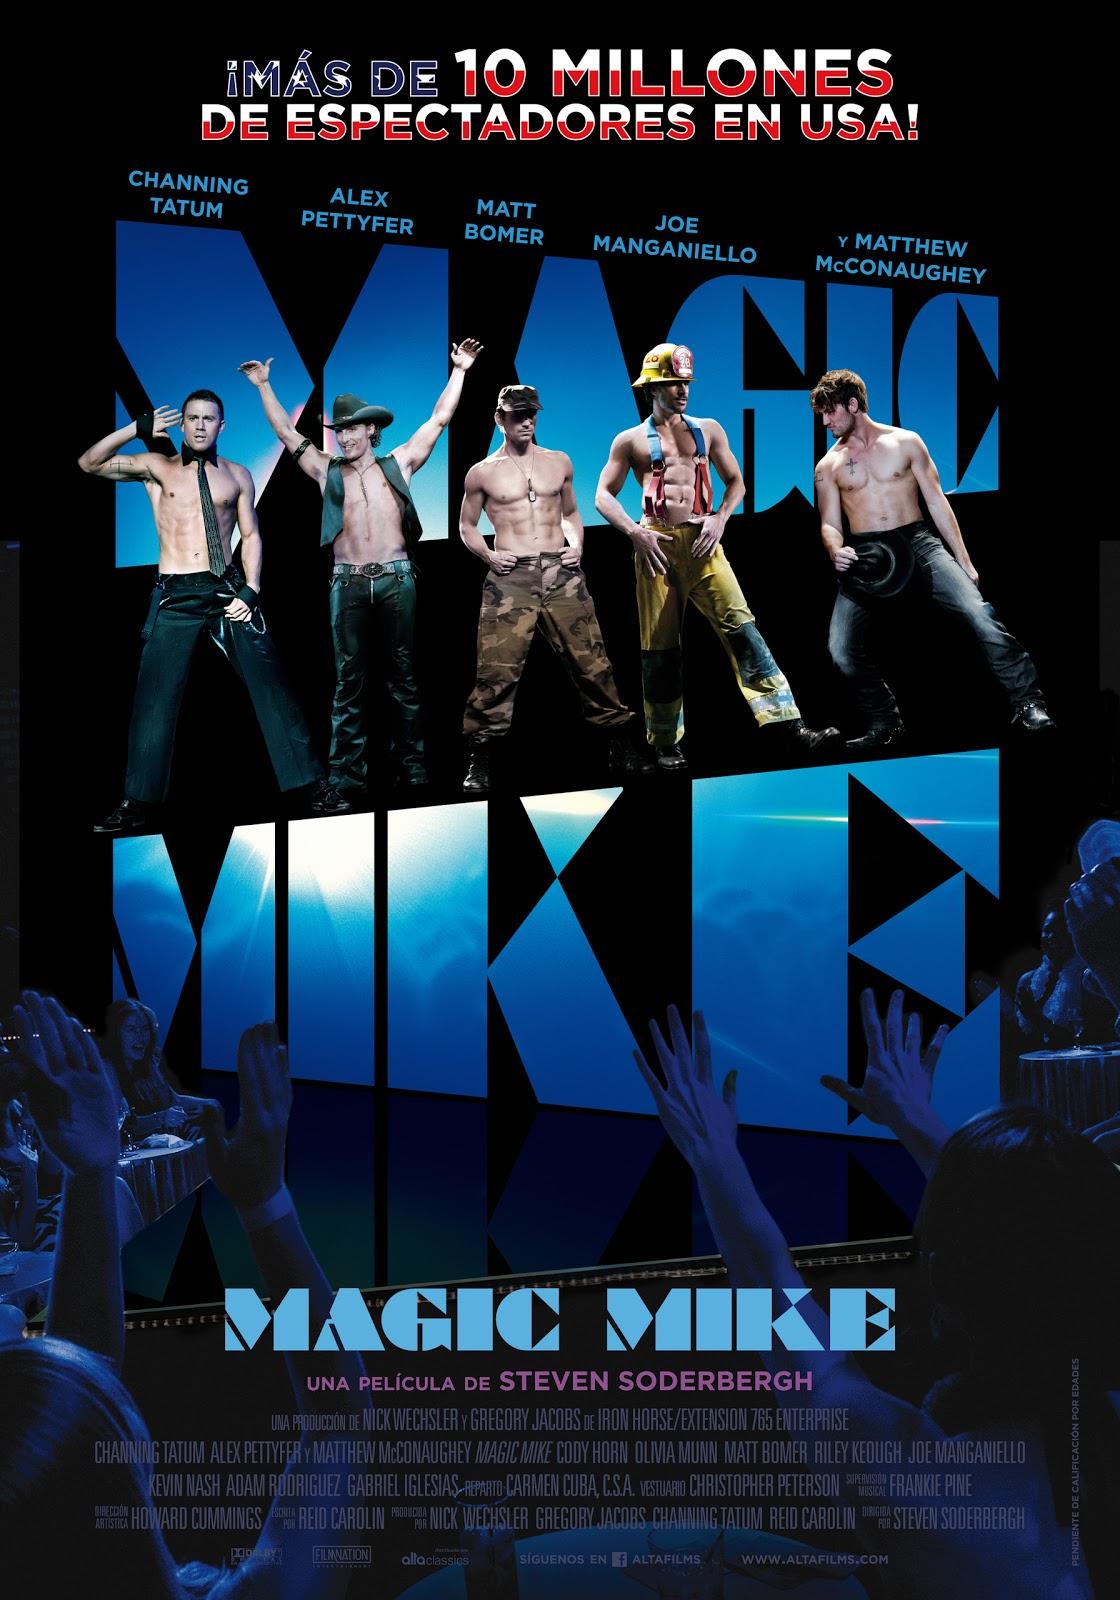 http://2.bp.blogspot.com/-Vupe6YuHzV4/UGyn5X8ChsI/AAAAAAAAAdI/_E68RyYQcsk/s1600/magic_mike_complot_af_8027.jpg